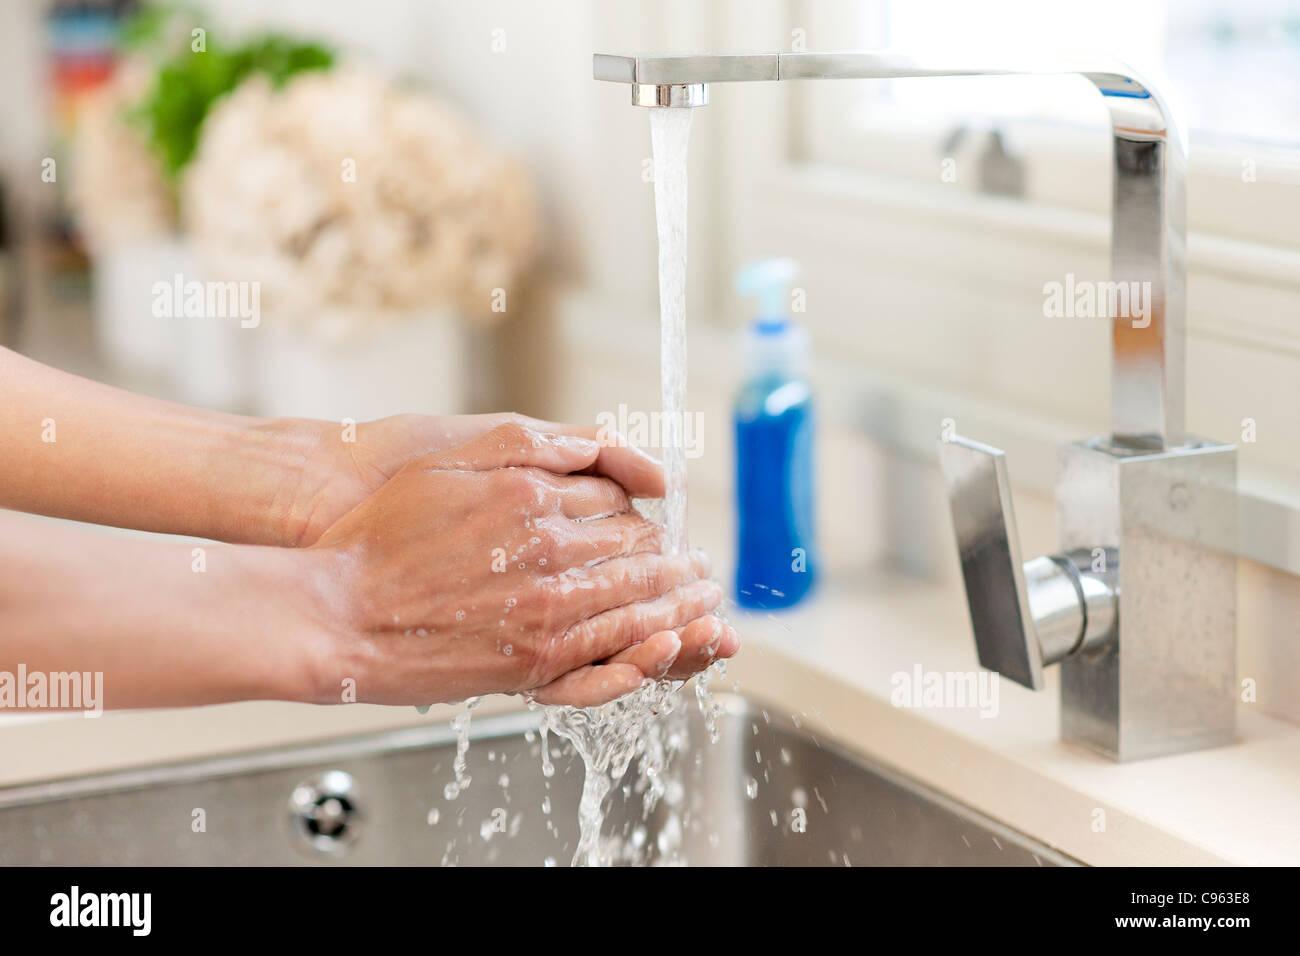 Washing hands. - Stock Image